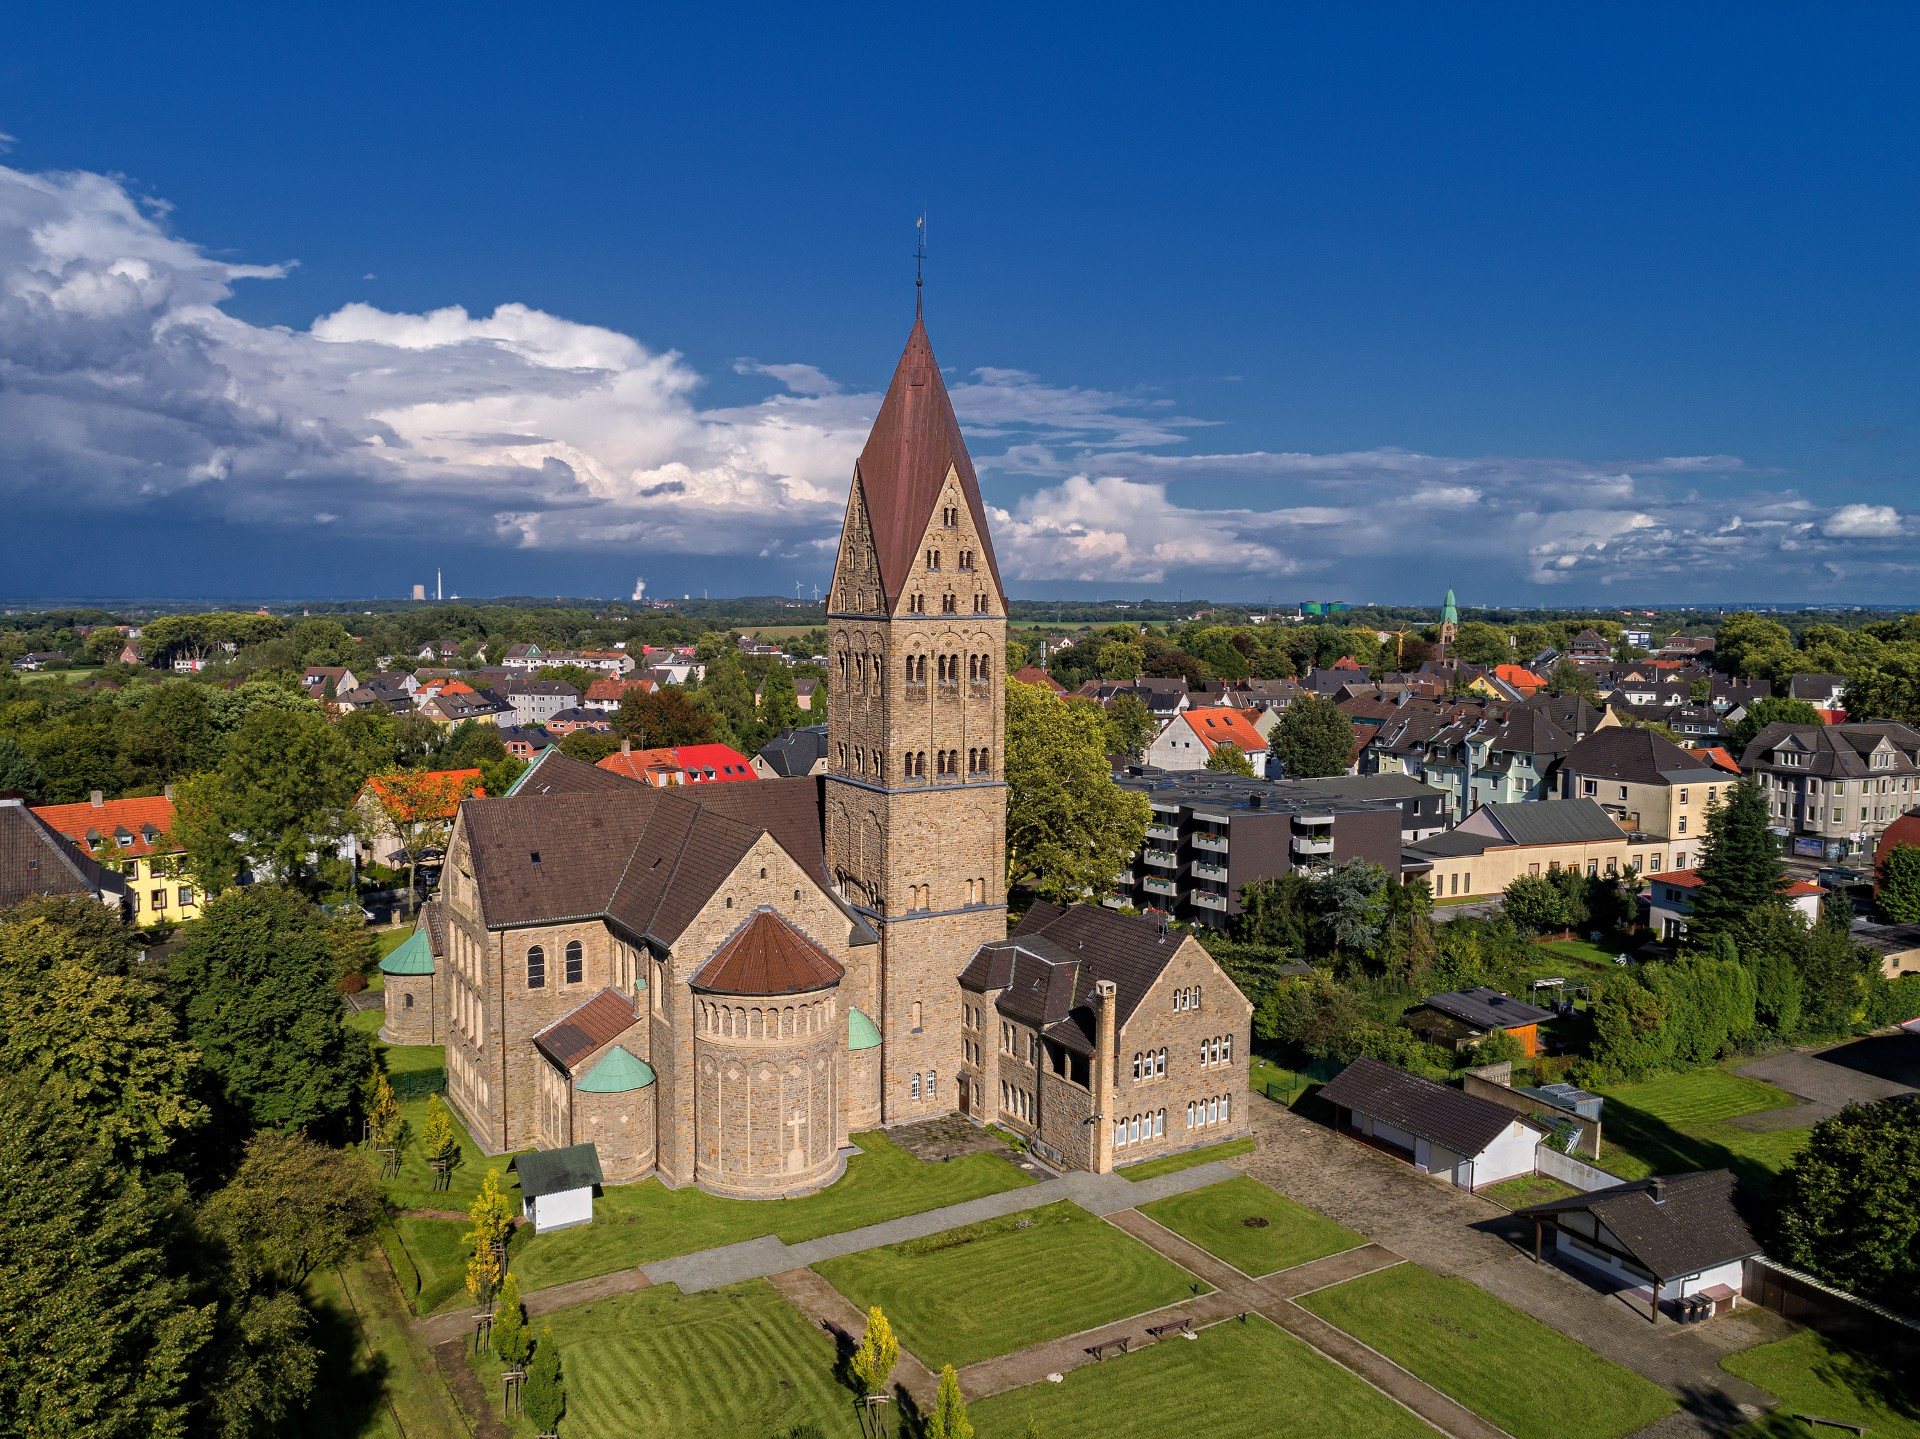 St. Elisabeth Kirche Bochum